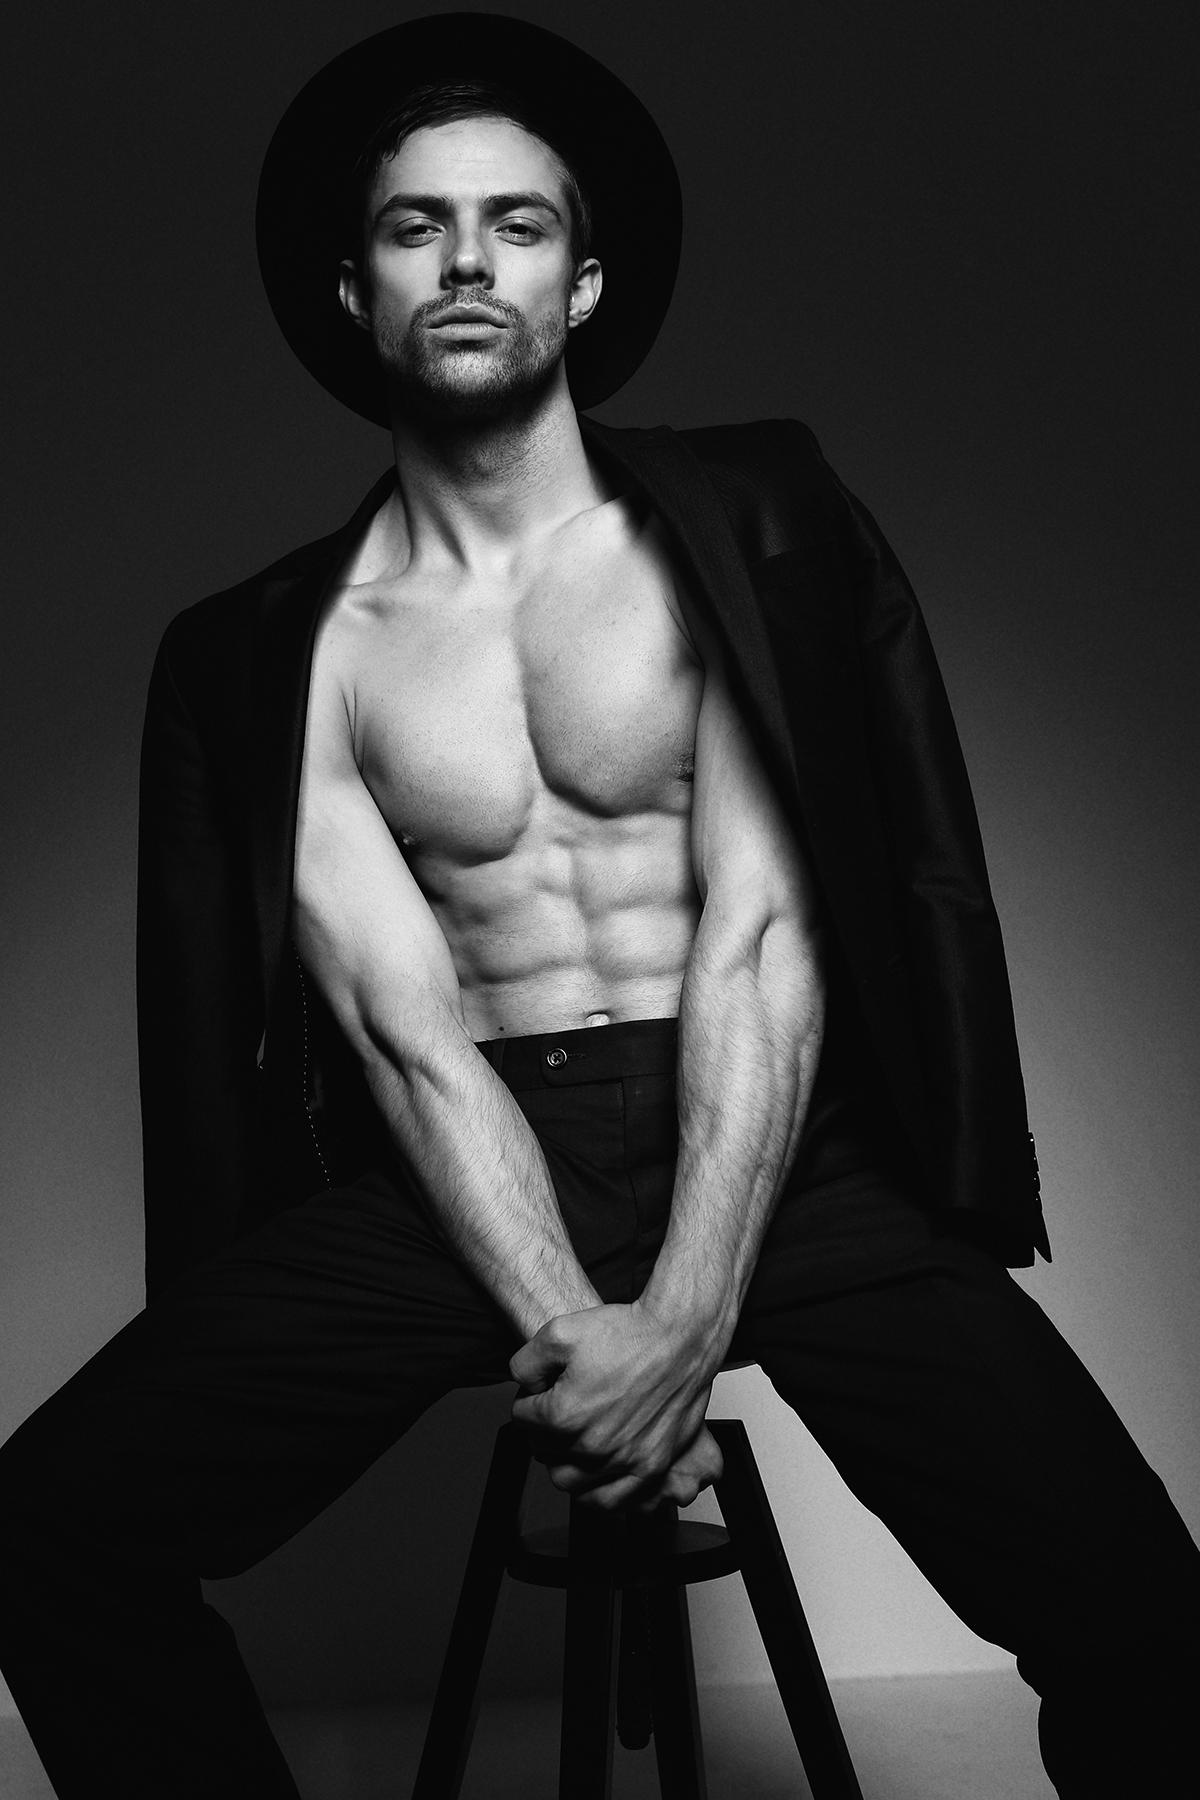 Adon Exclusive: Model Mantvydas Lenkas By Migle Golubickaite